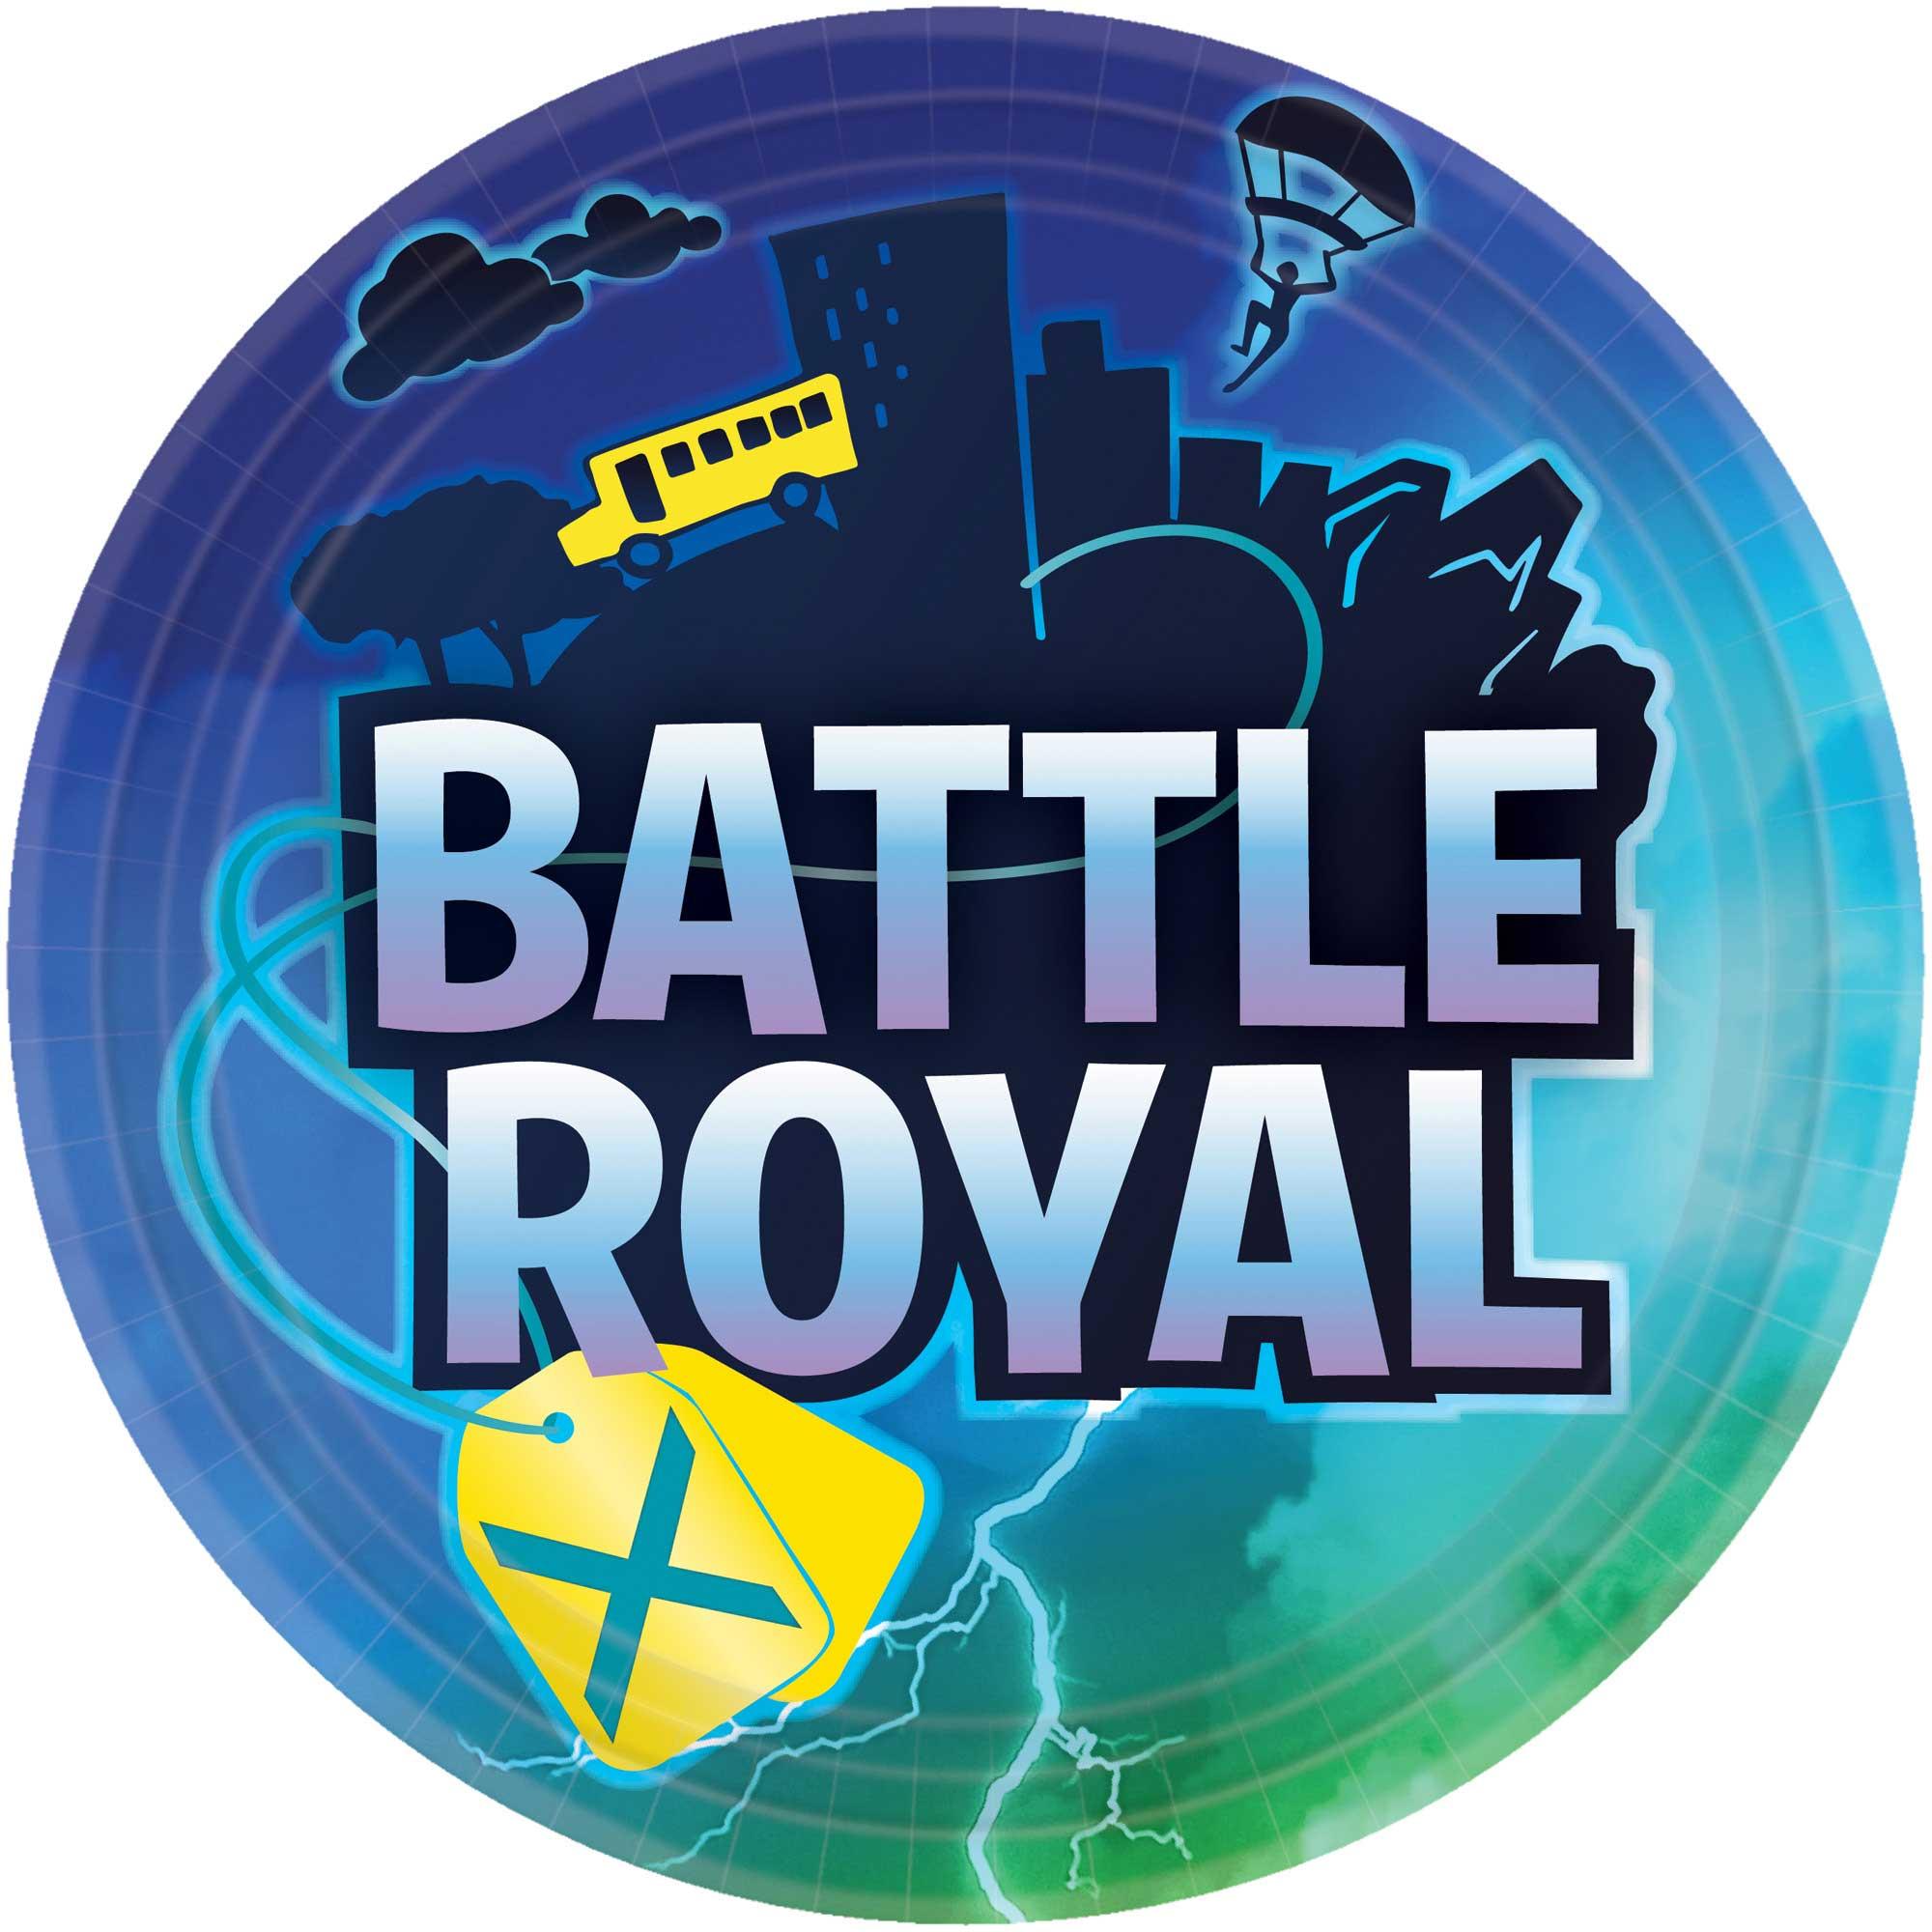 """Battle Royal 9""""/ 23cm Paper Dinner Plates"